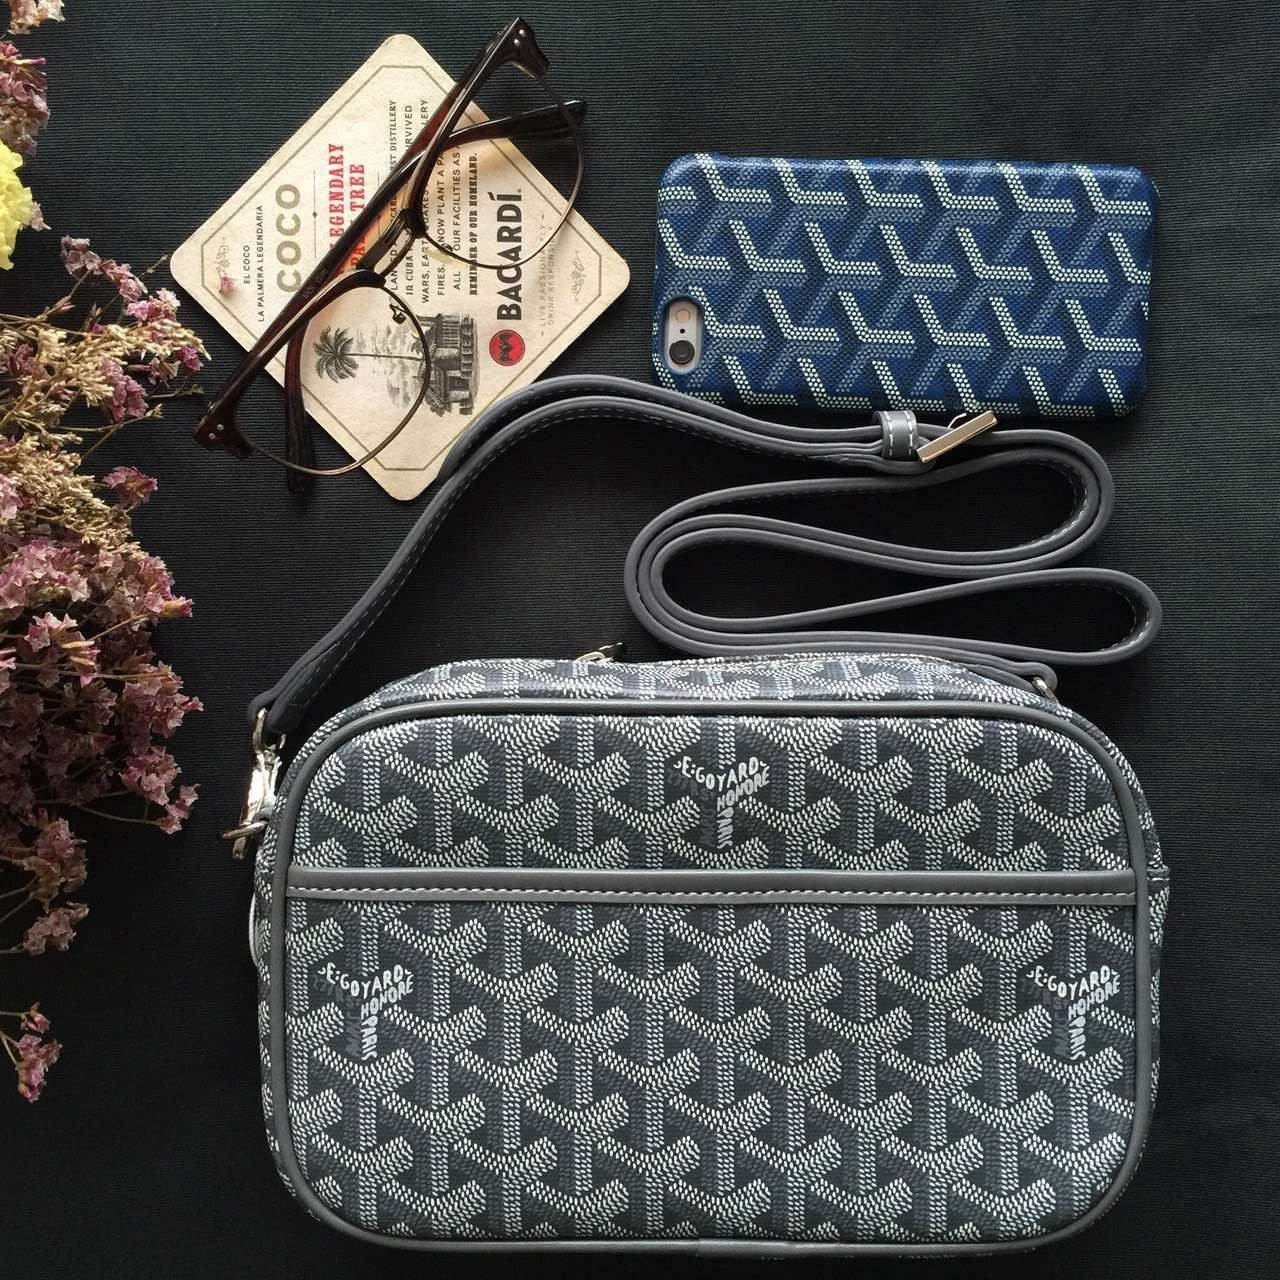 Goyard Camera Case Bag 68 Email Winnie Shoescrazy Net Goyard Tote Goyard Bag Bags